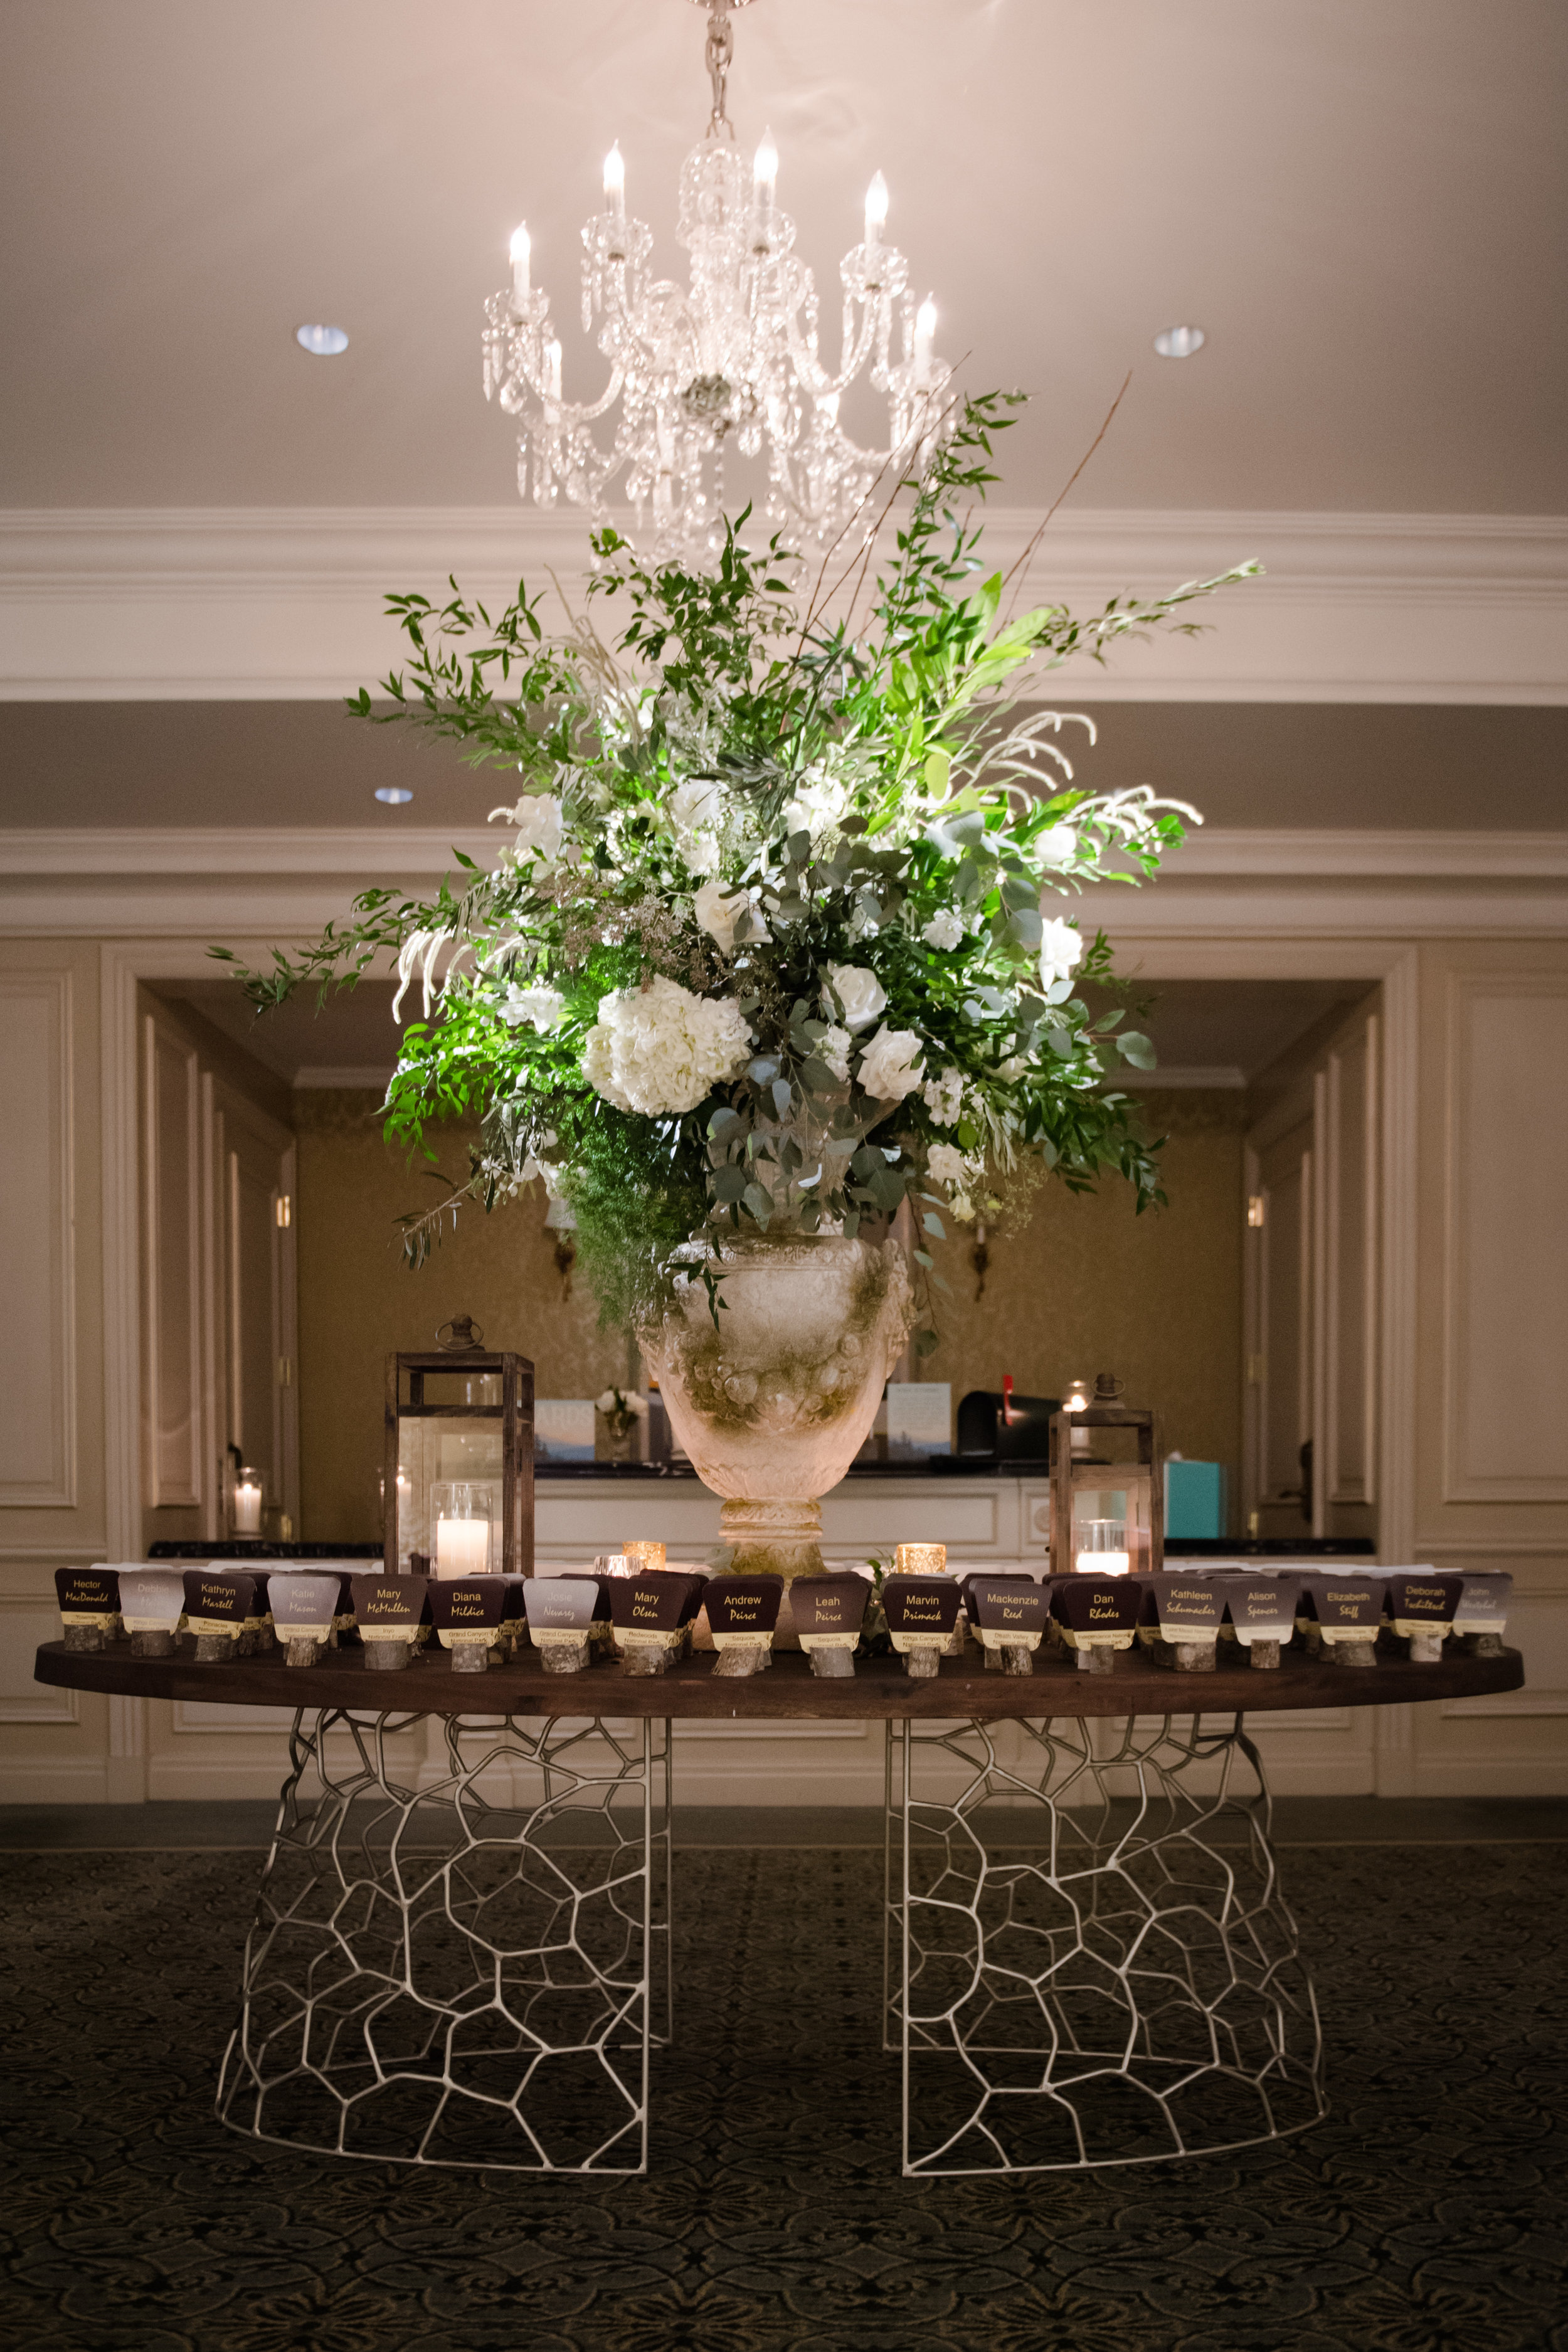 Design & Floral:    Kehoe Designs    | Lighting & Sound:    BlackOak Technical Productions    | Photo:    Studio This Is Photography    | Venue:    Four Seasons Hotel Chicago